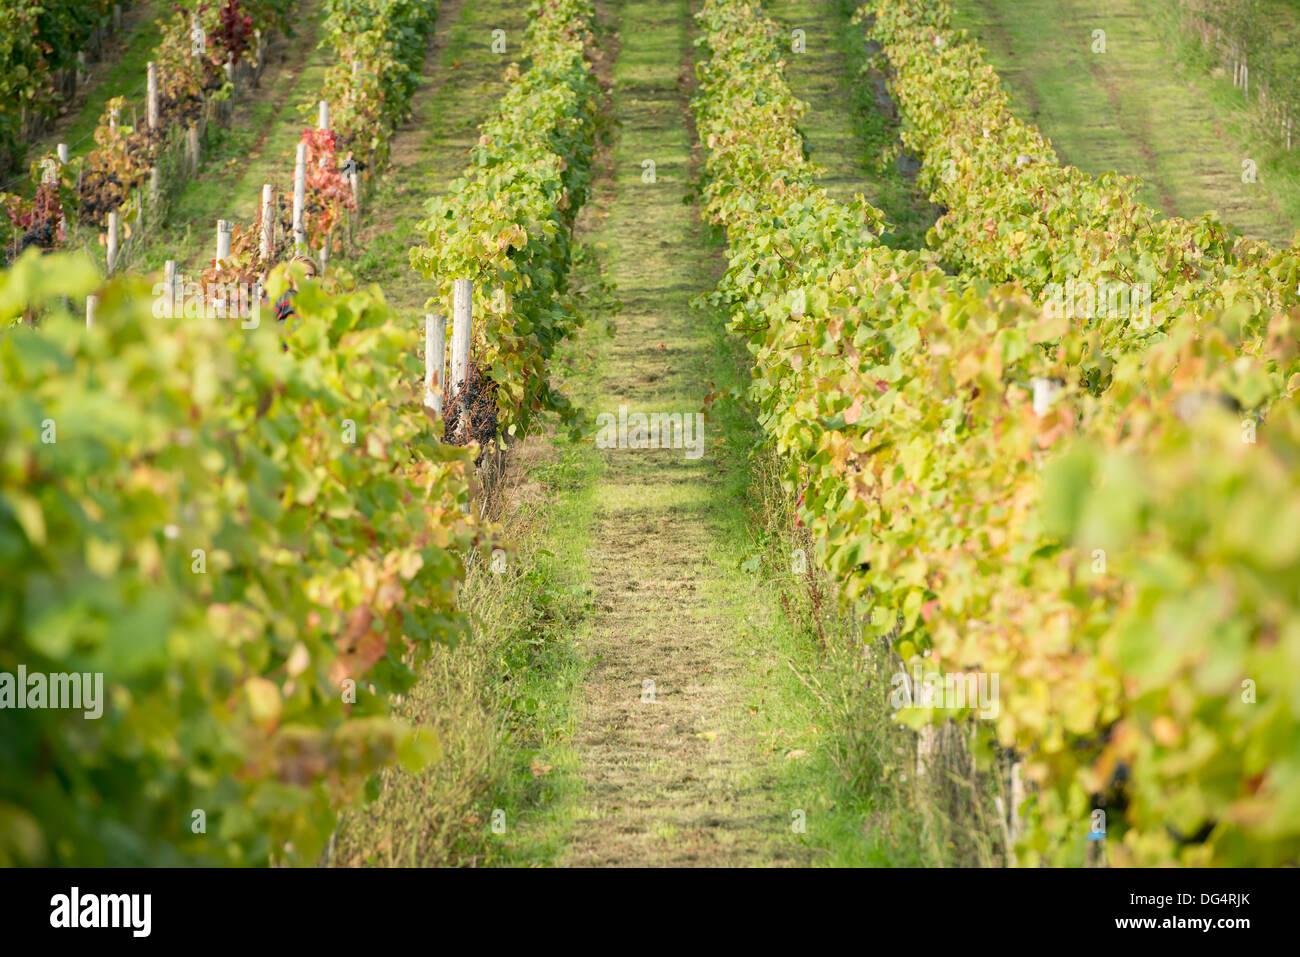 rows of grape vines at harvest time at the Stapley family run Redyeates Vineyard near Crediton, Devon Stock Photo